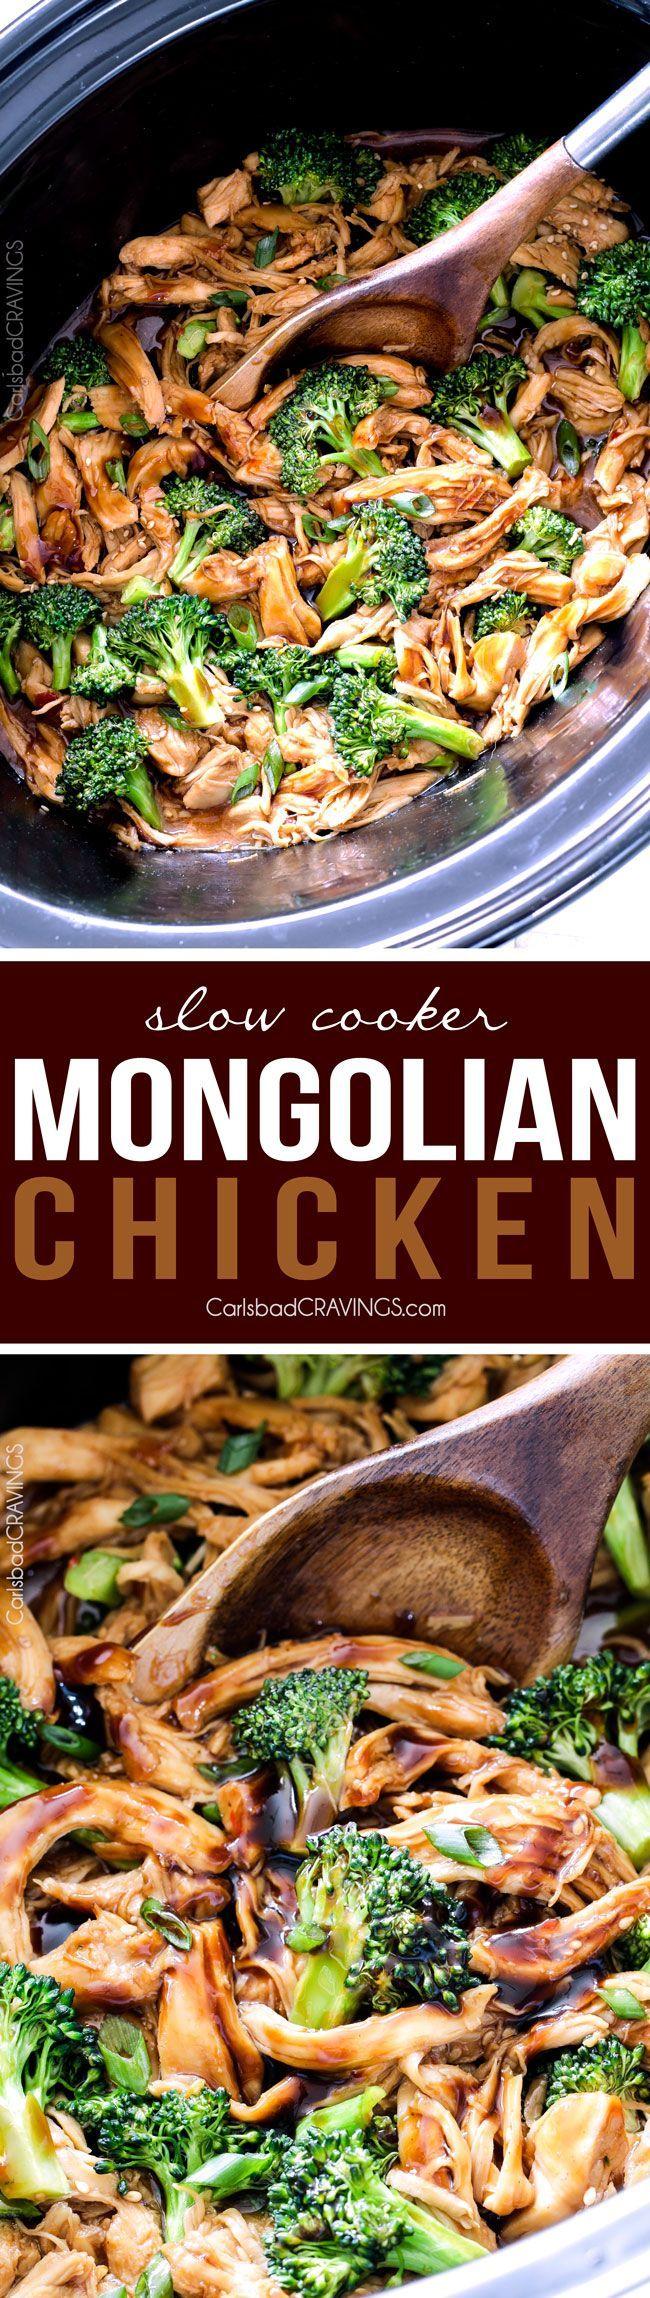 Slow Cooker Mongolian Chicken